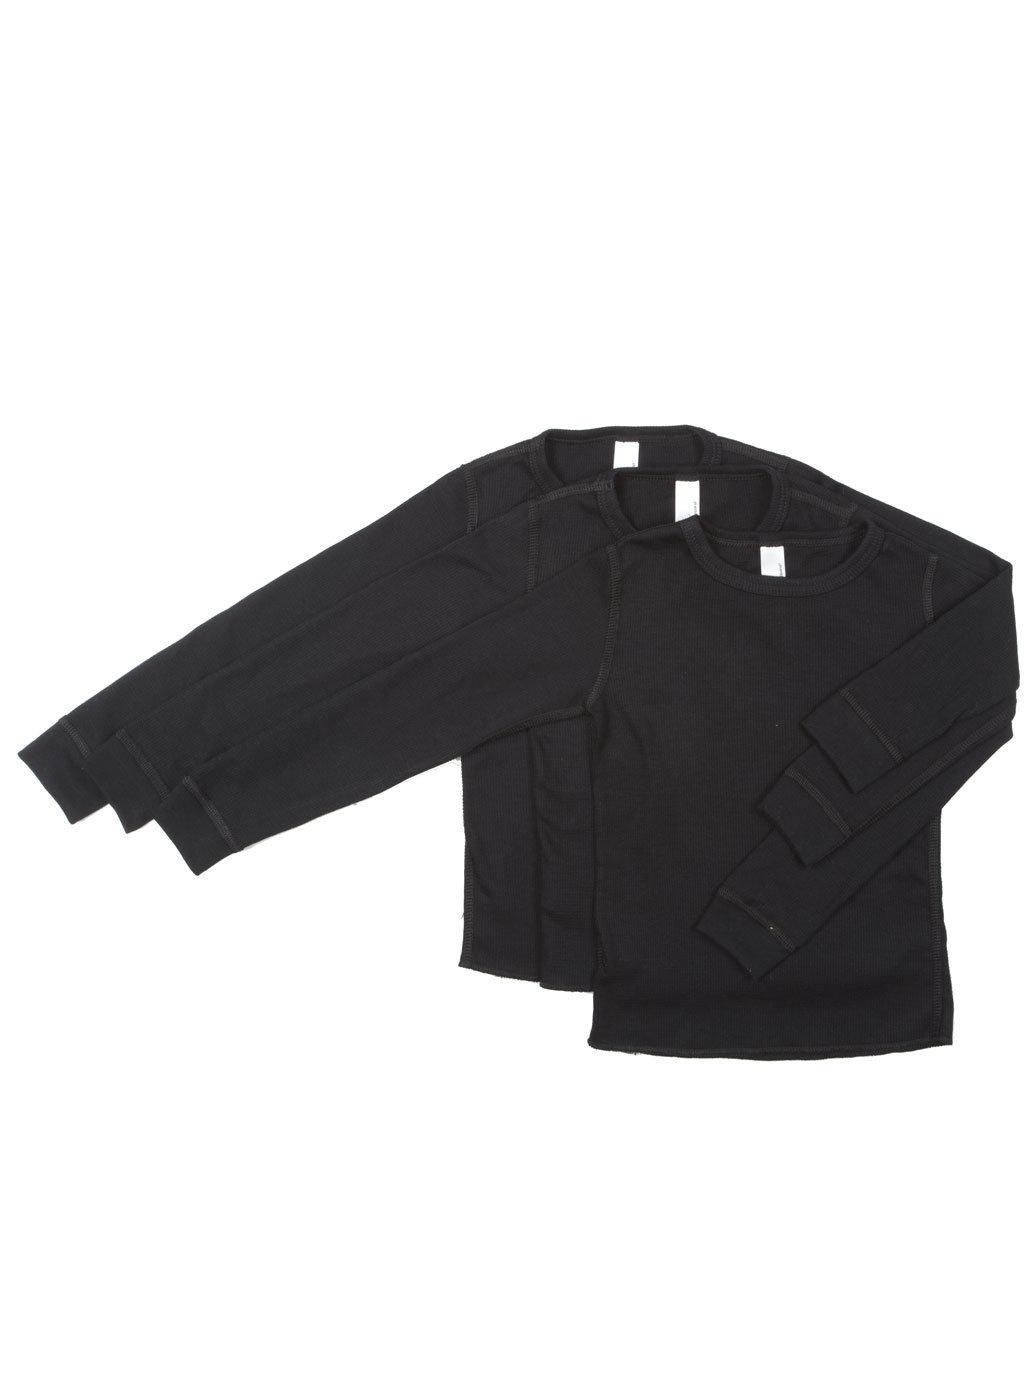 Black Dress Shirts For Boys